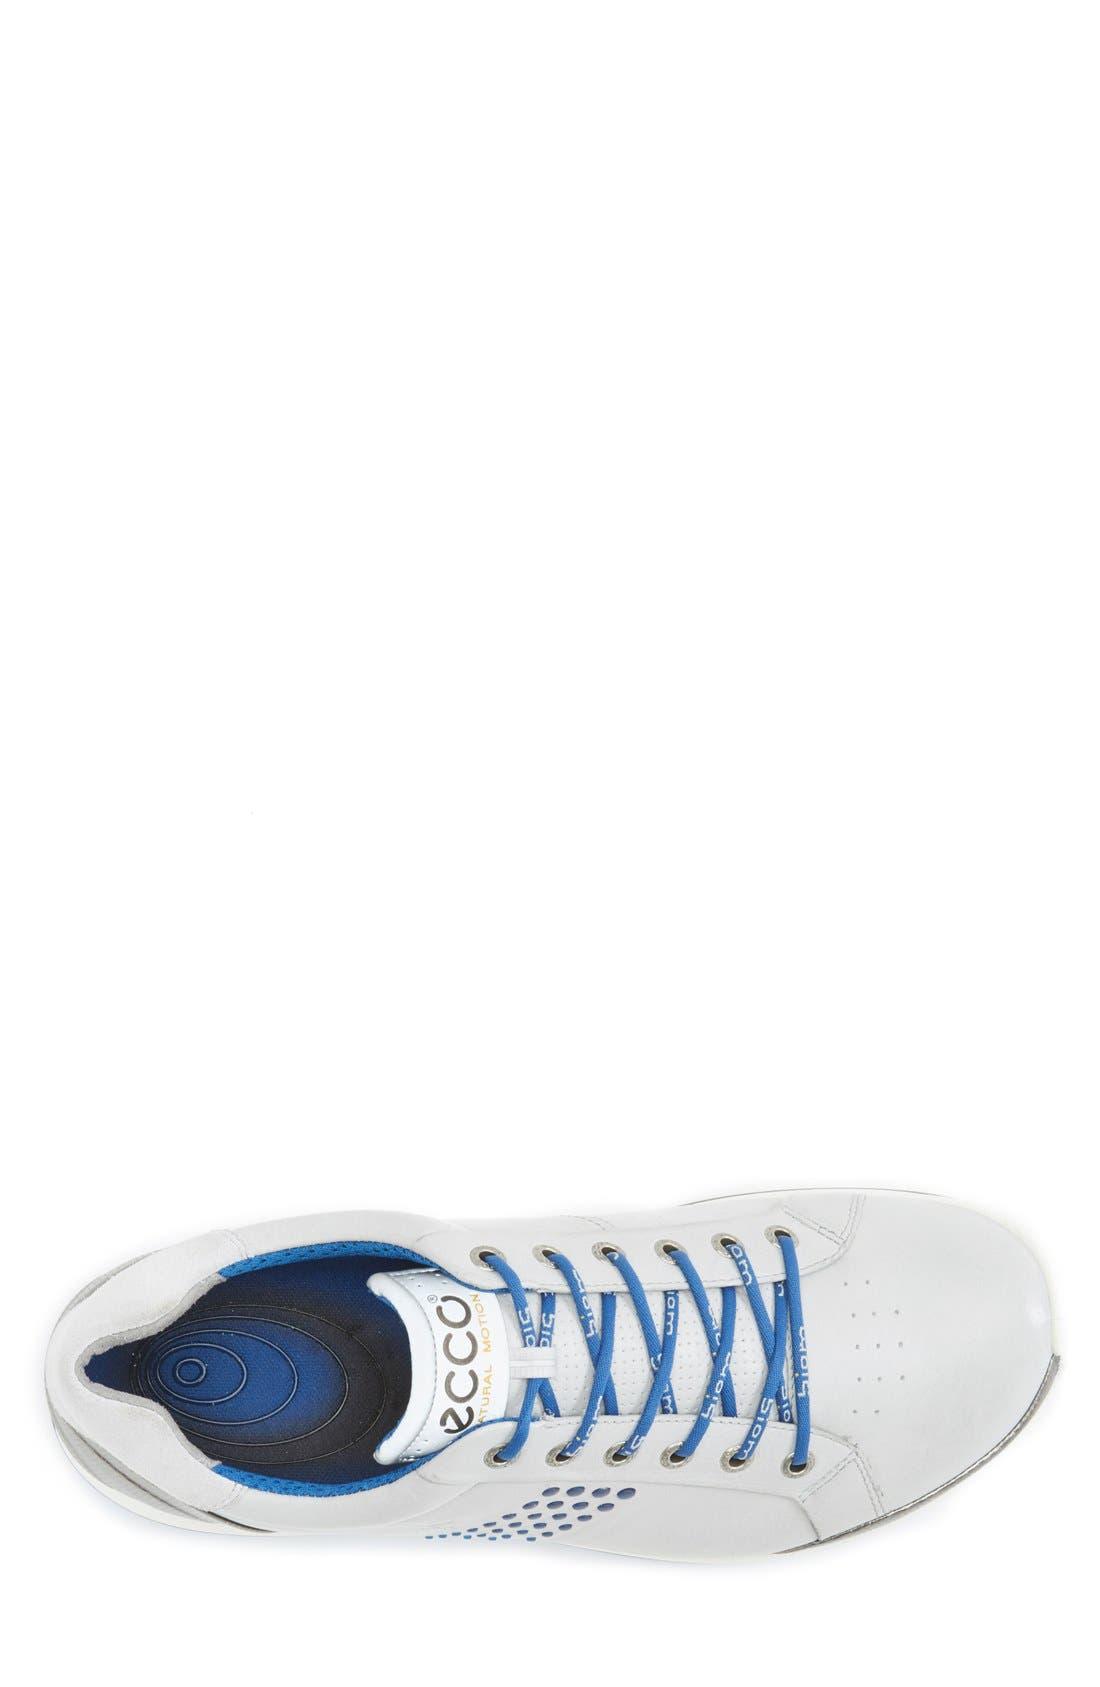 BIOM Hybrid 2 Golf Shoe,                             Alternate thumbnail 3, color,                             Concrete/ Royal